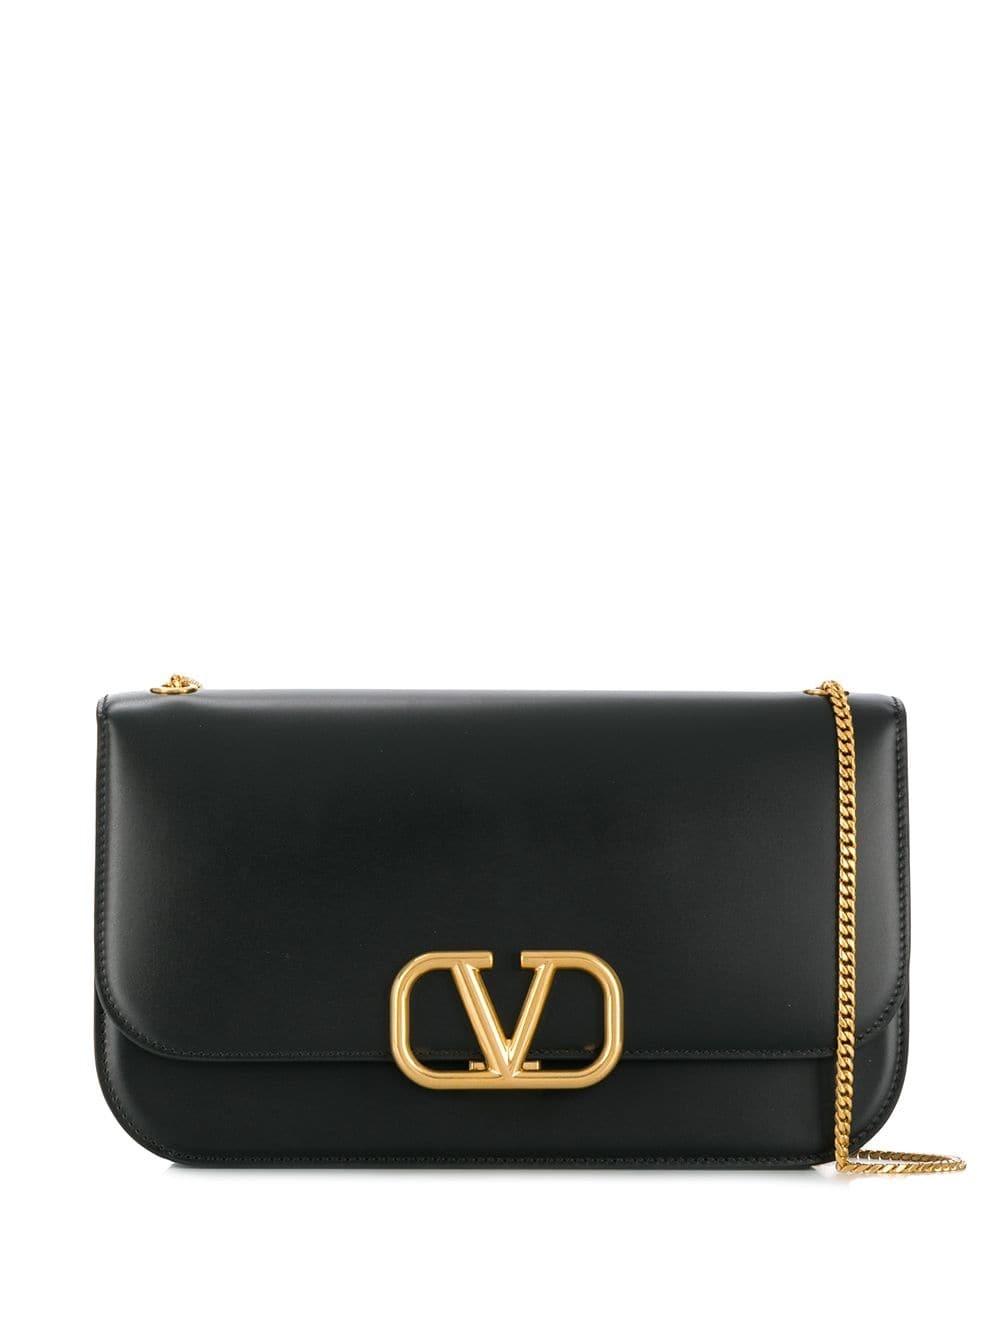 Valentino Garavani V Logo Shoulder Bag